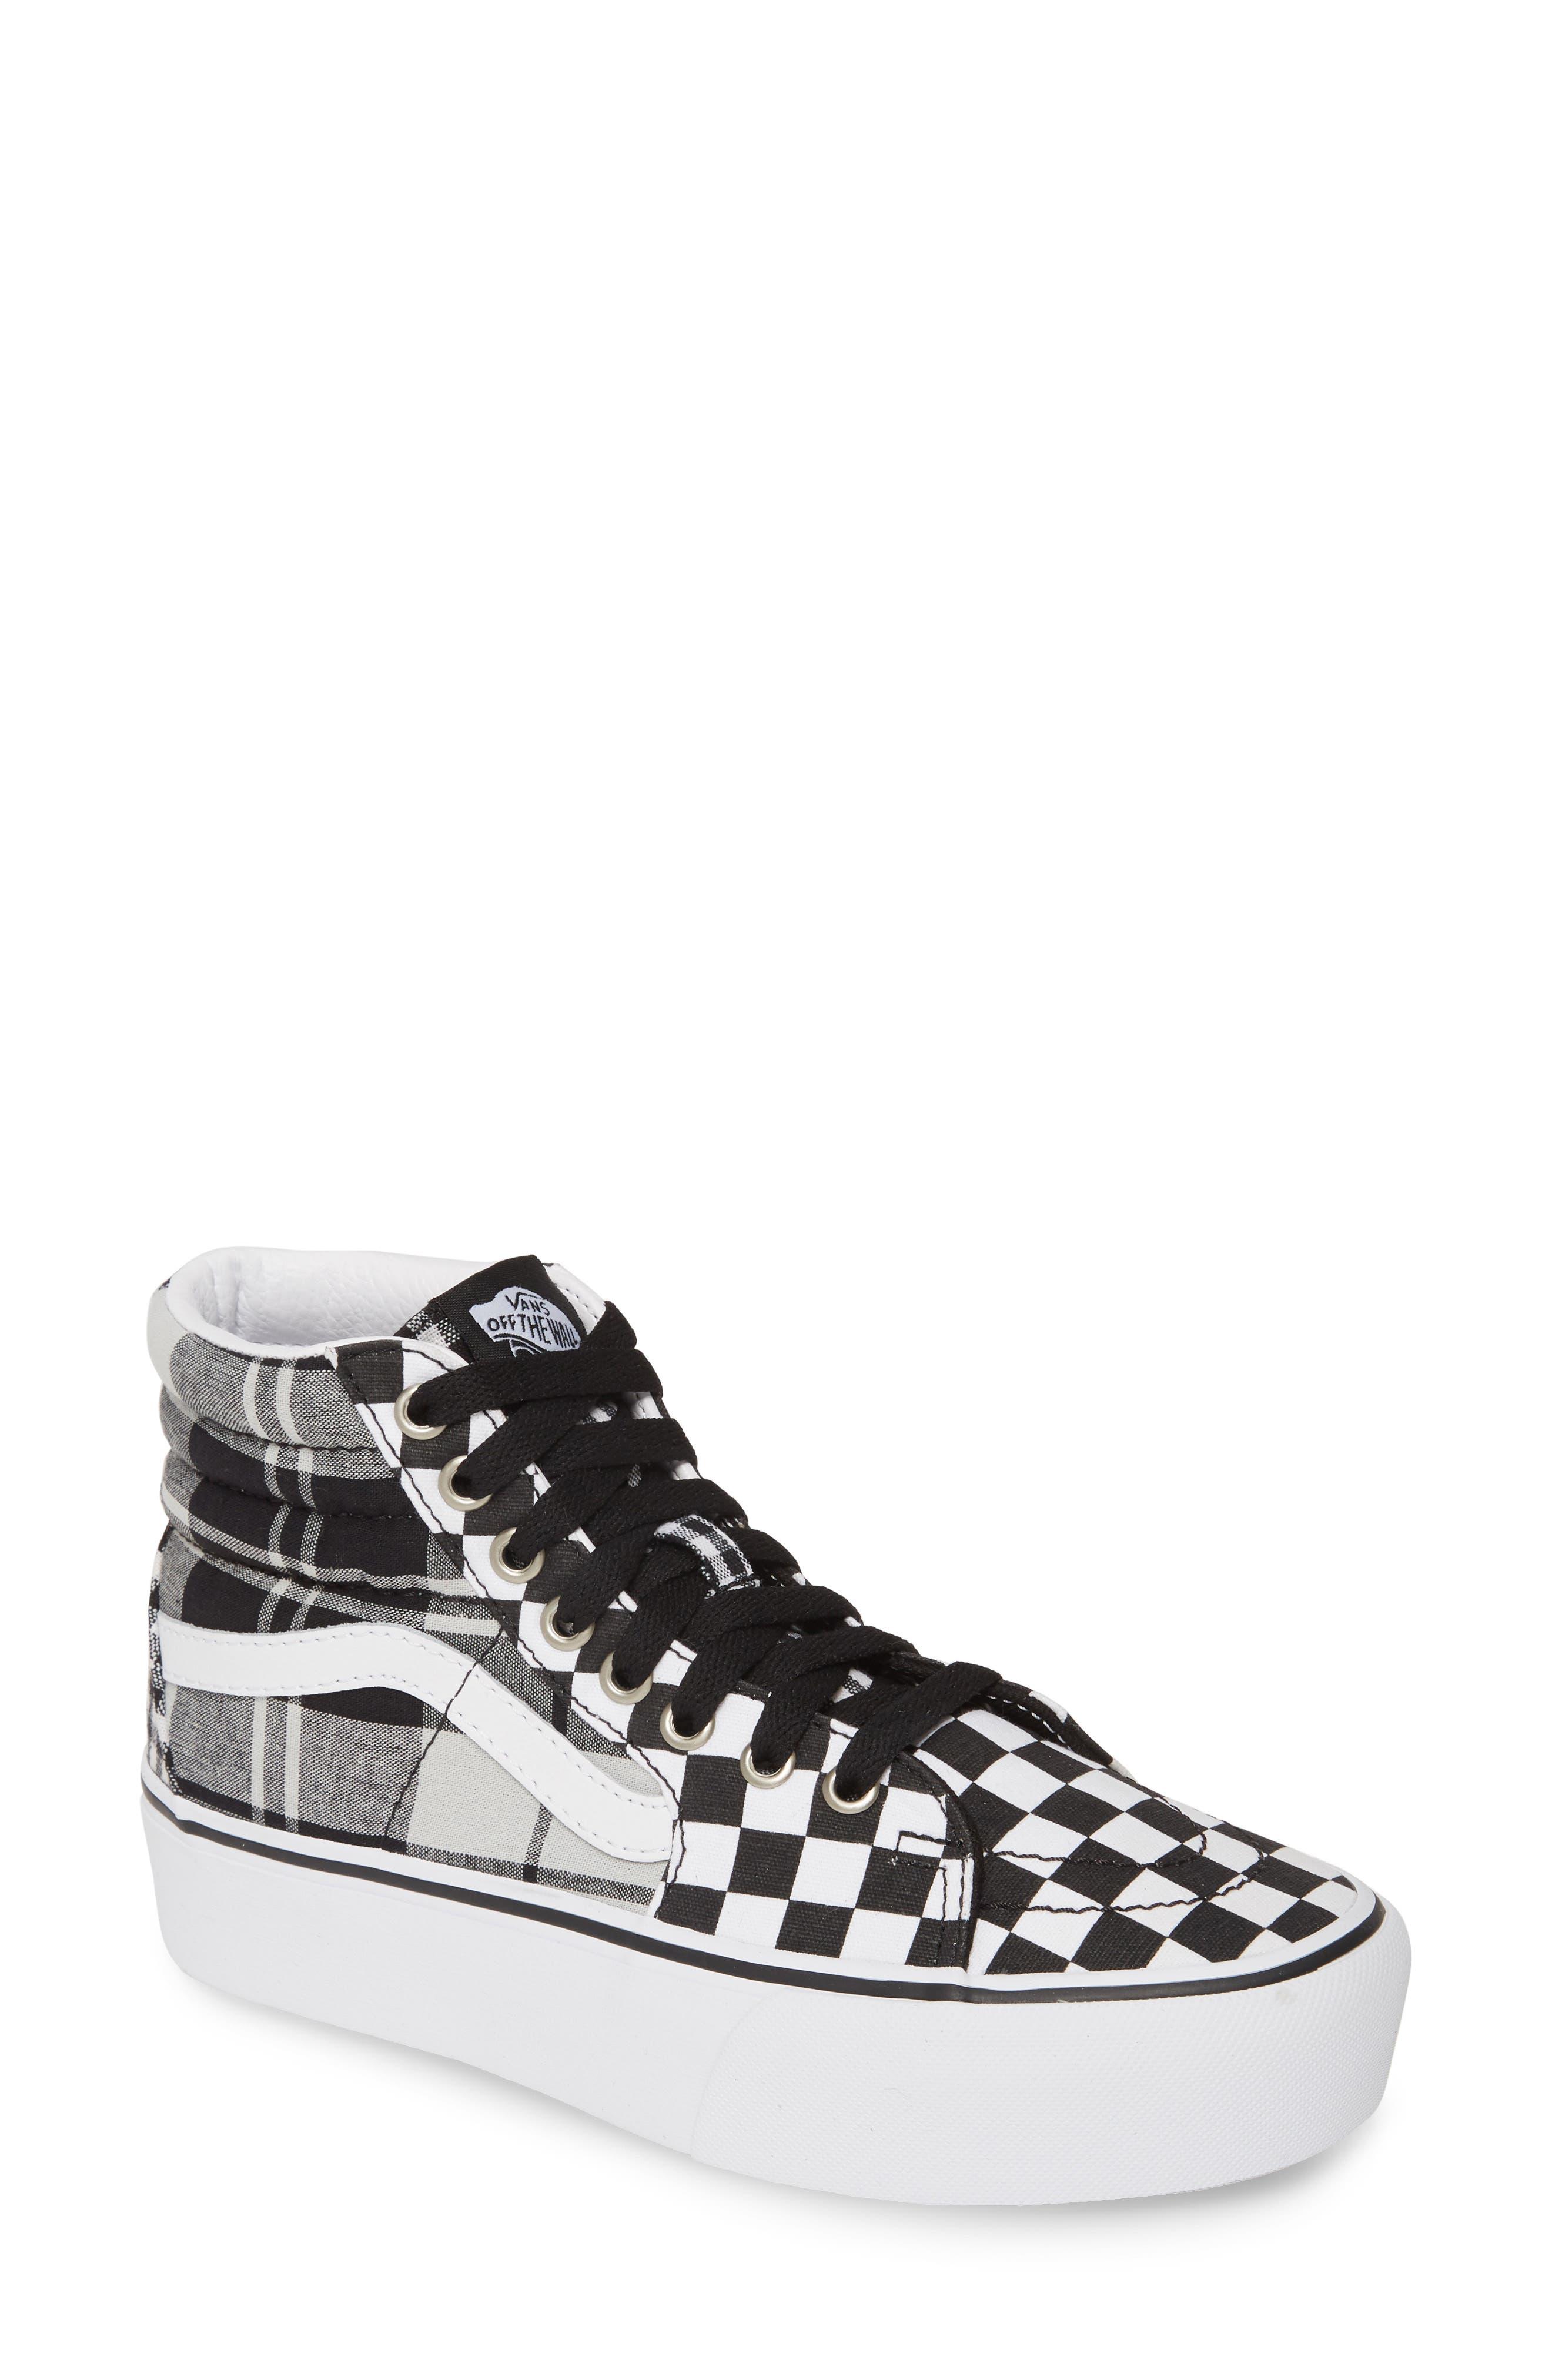 Vans Sk8-Hi Platform Sneaker- Black